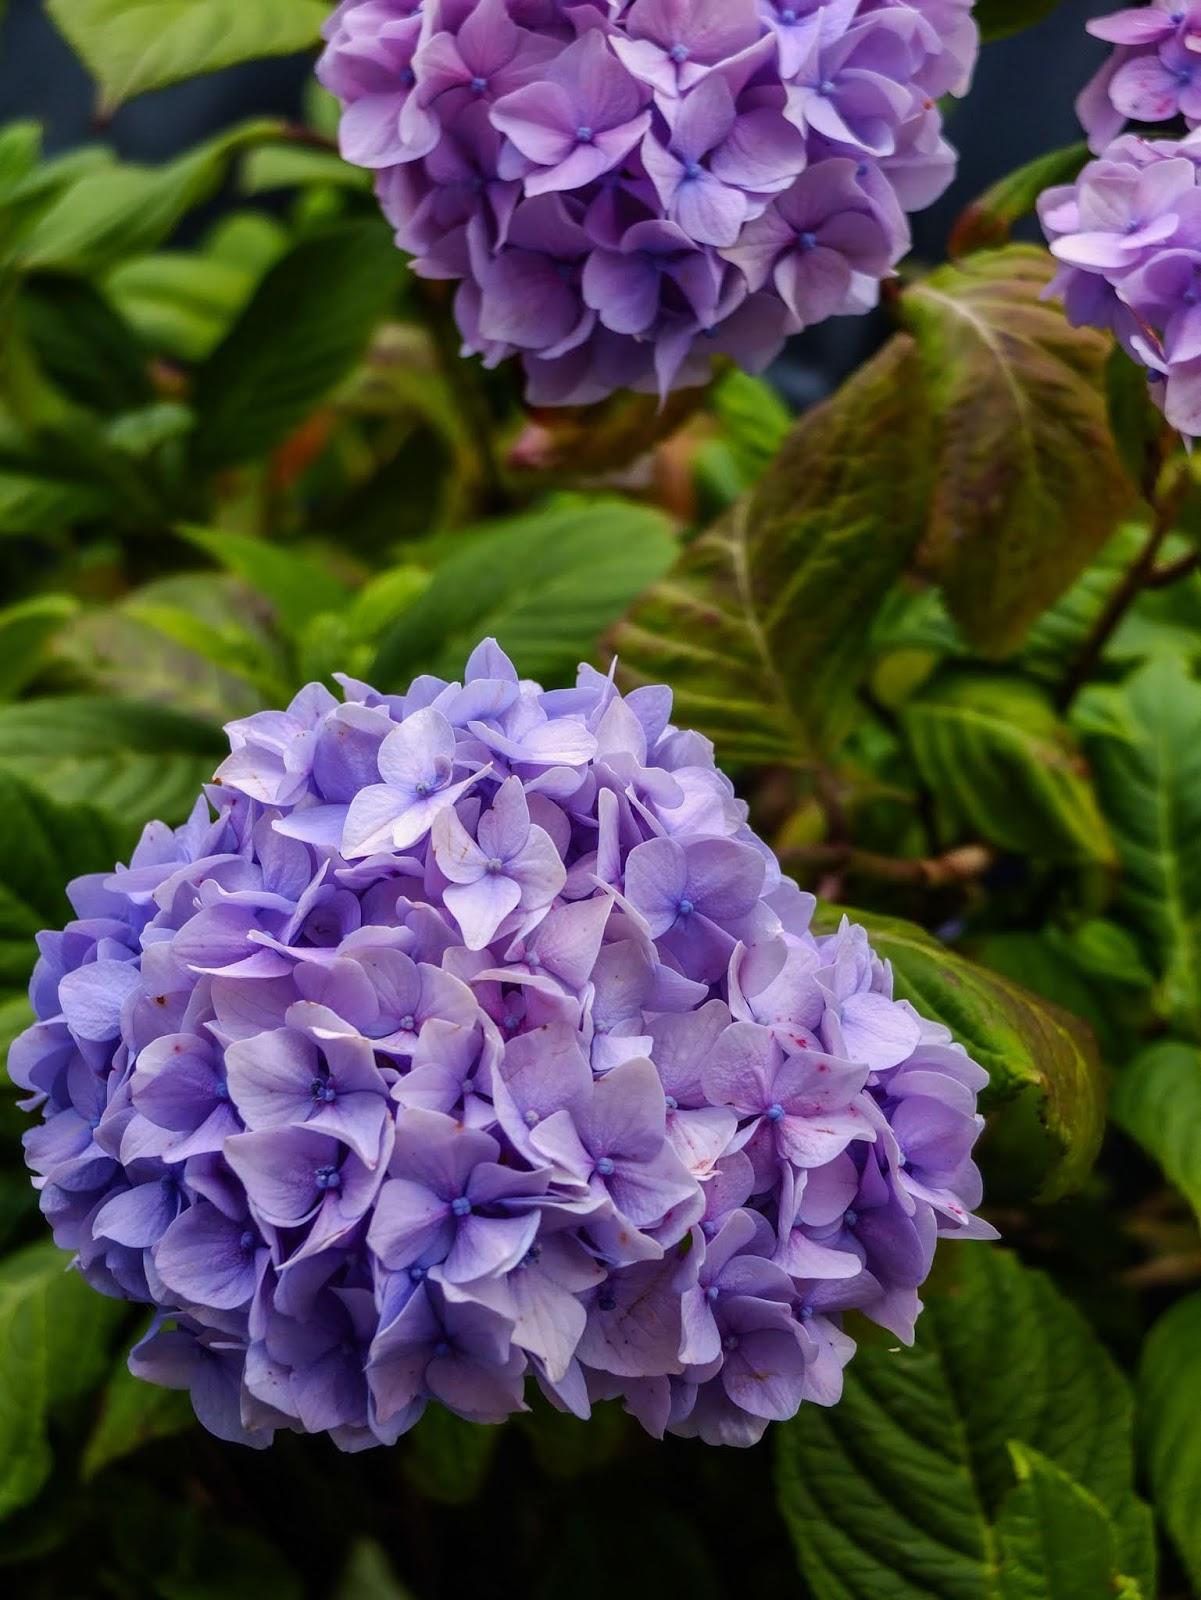 Two big purple hydrangea heads.